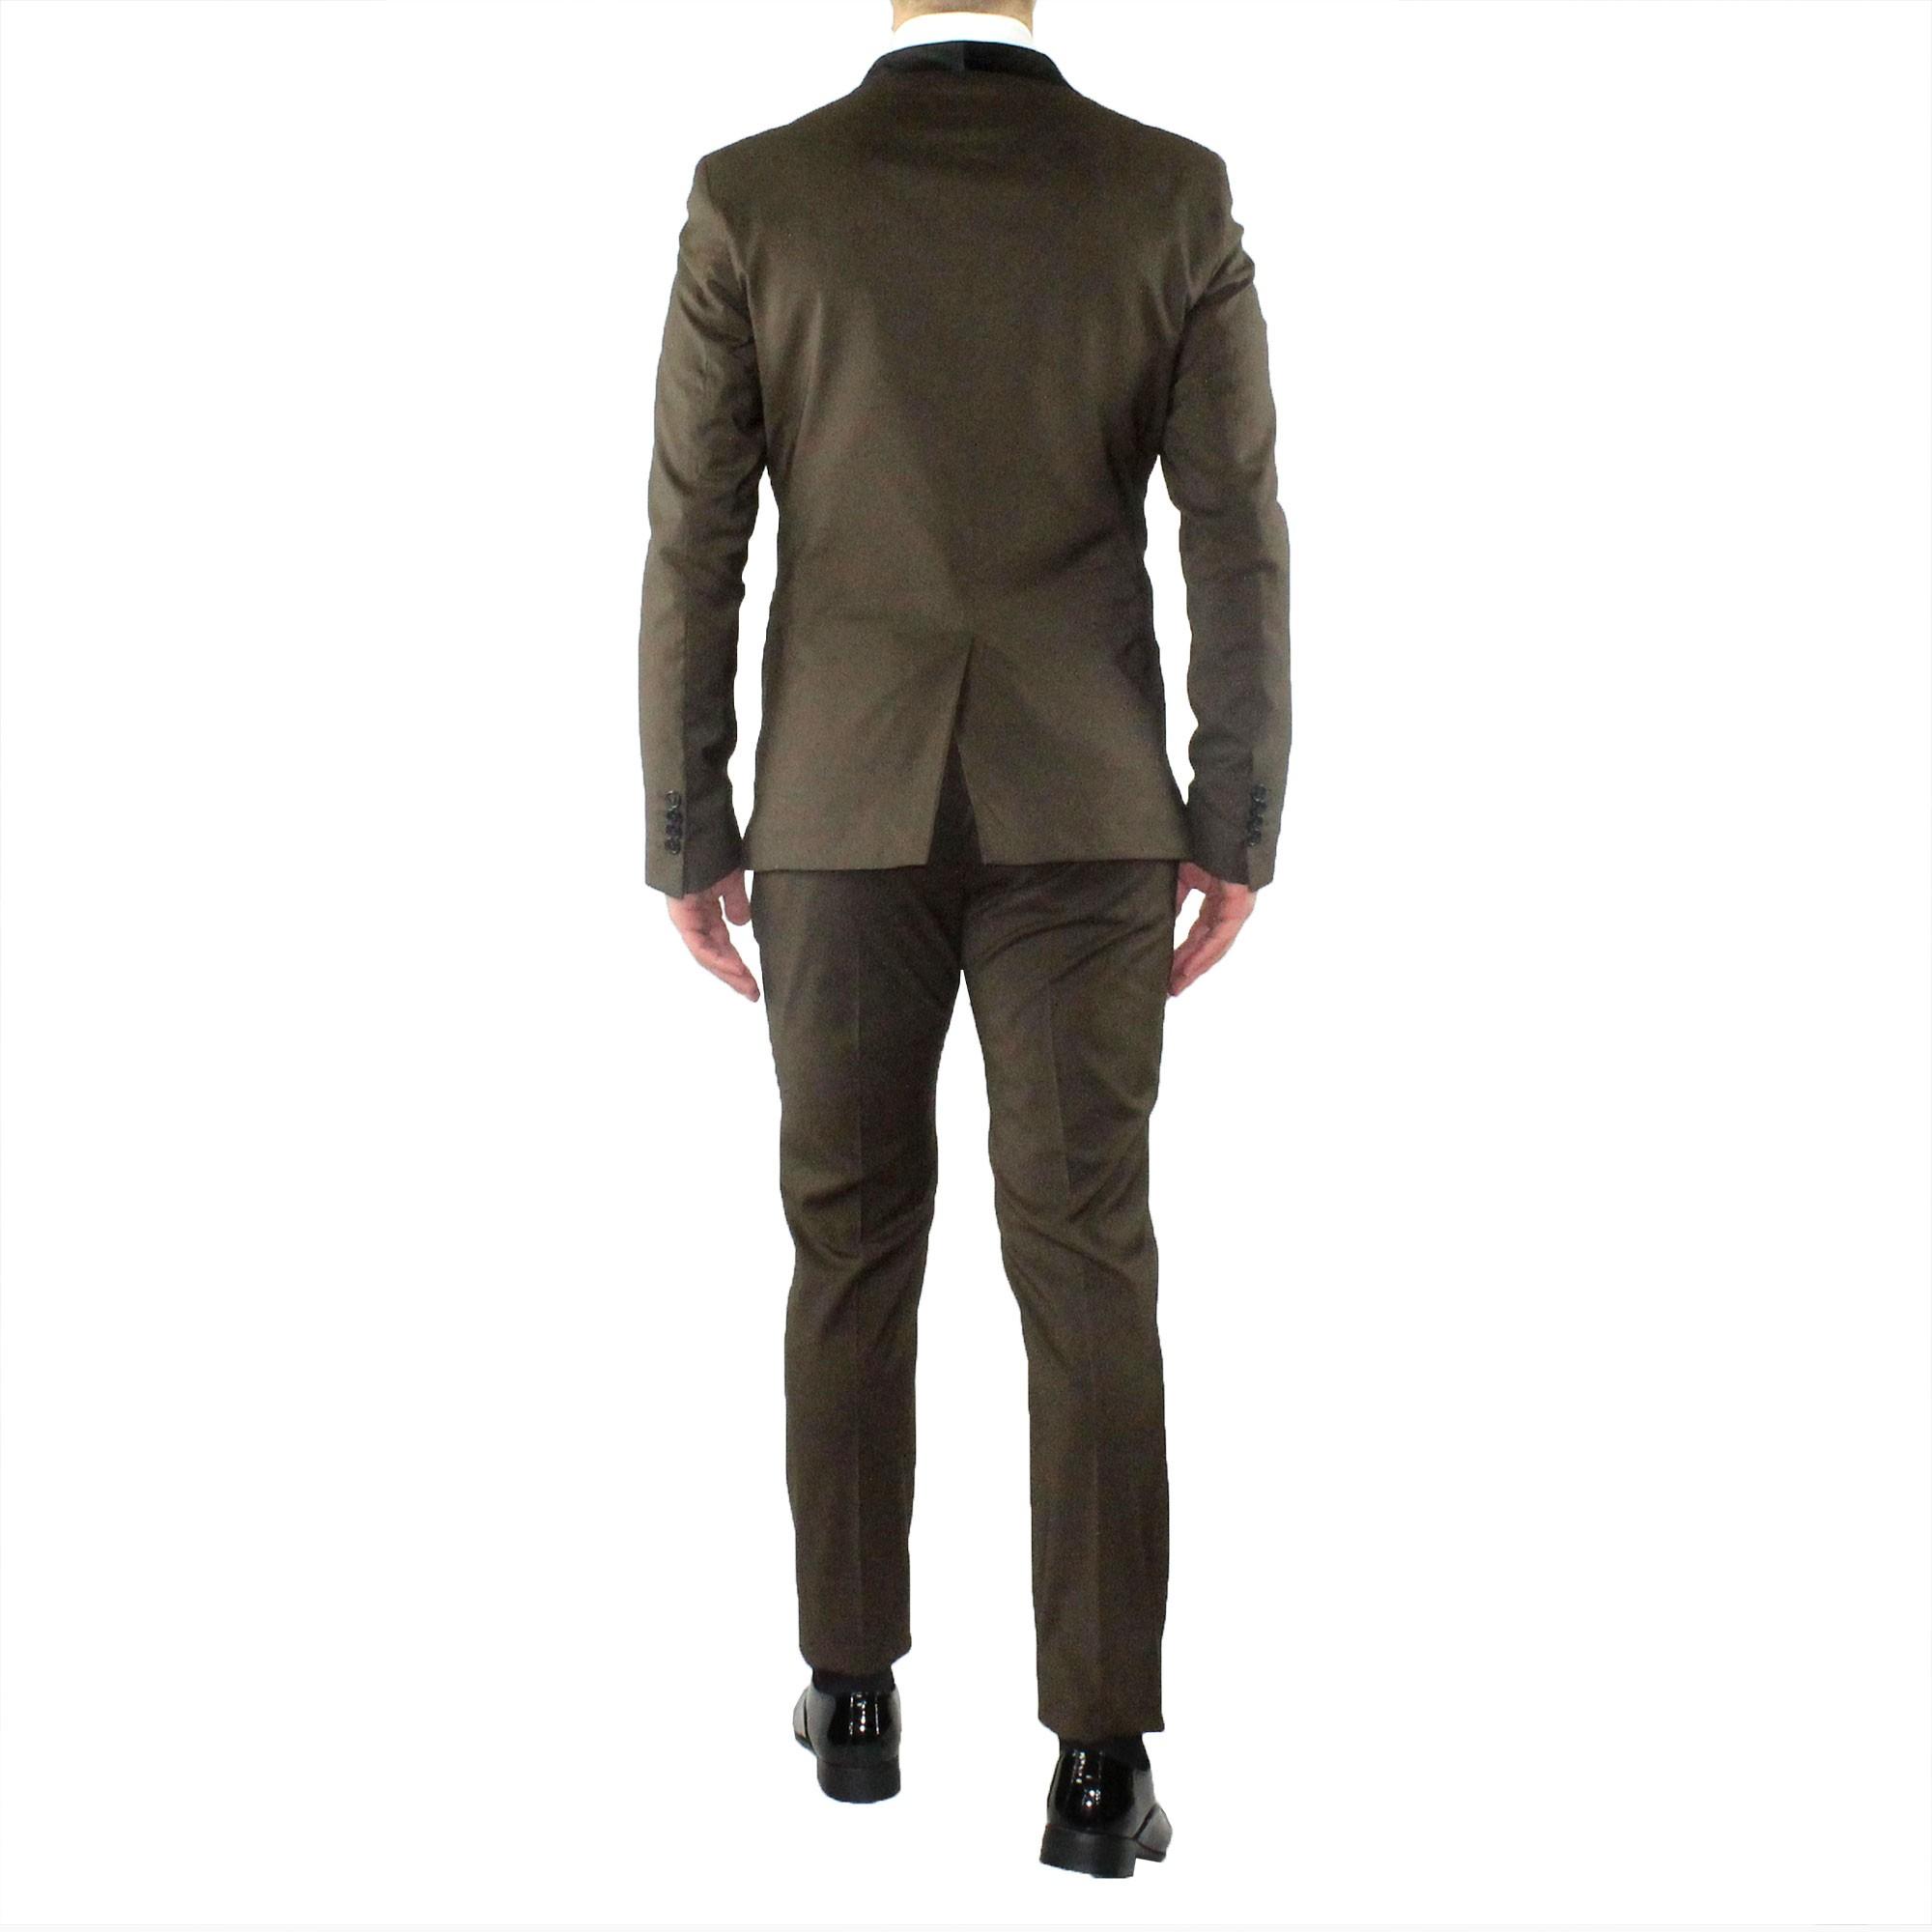 Abito-Uomo-Smoking-Elegante-Vestito-Completo-Estivo-Cerimonia-Sartoriale-Slim miniatura 19